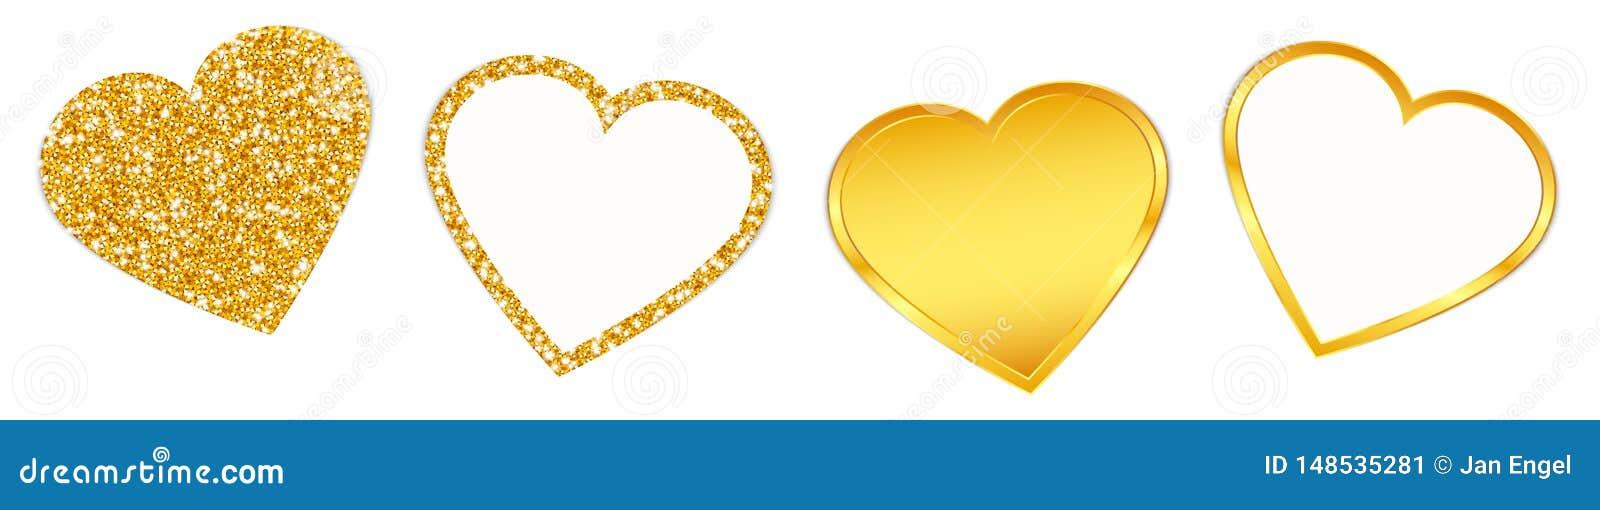 Quatre coeurs d or miroitant et brillant l ensemble